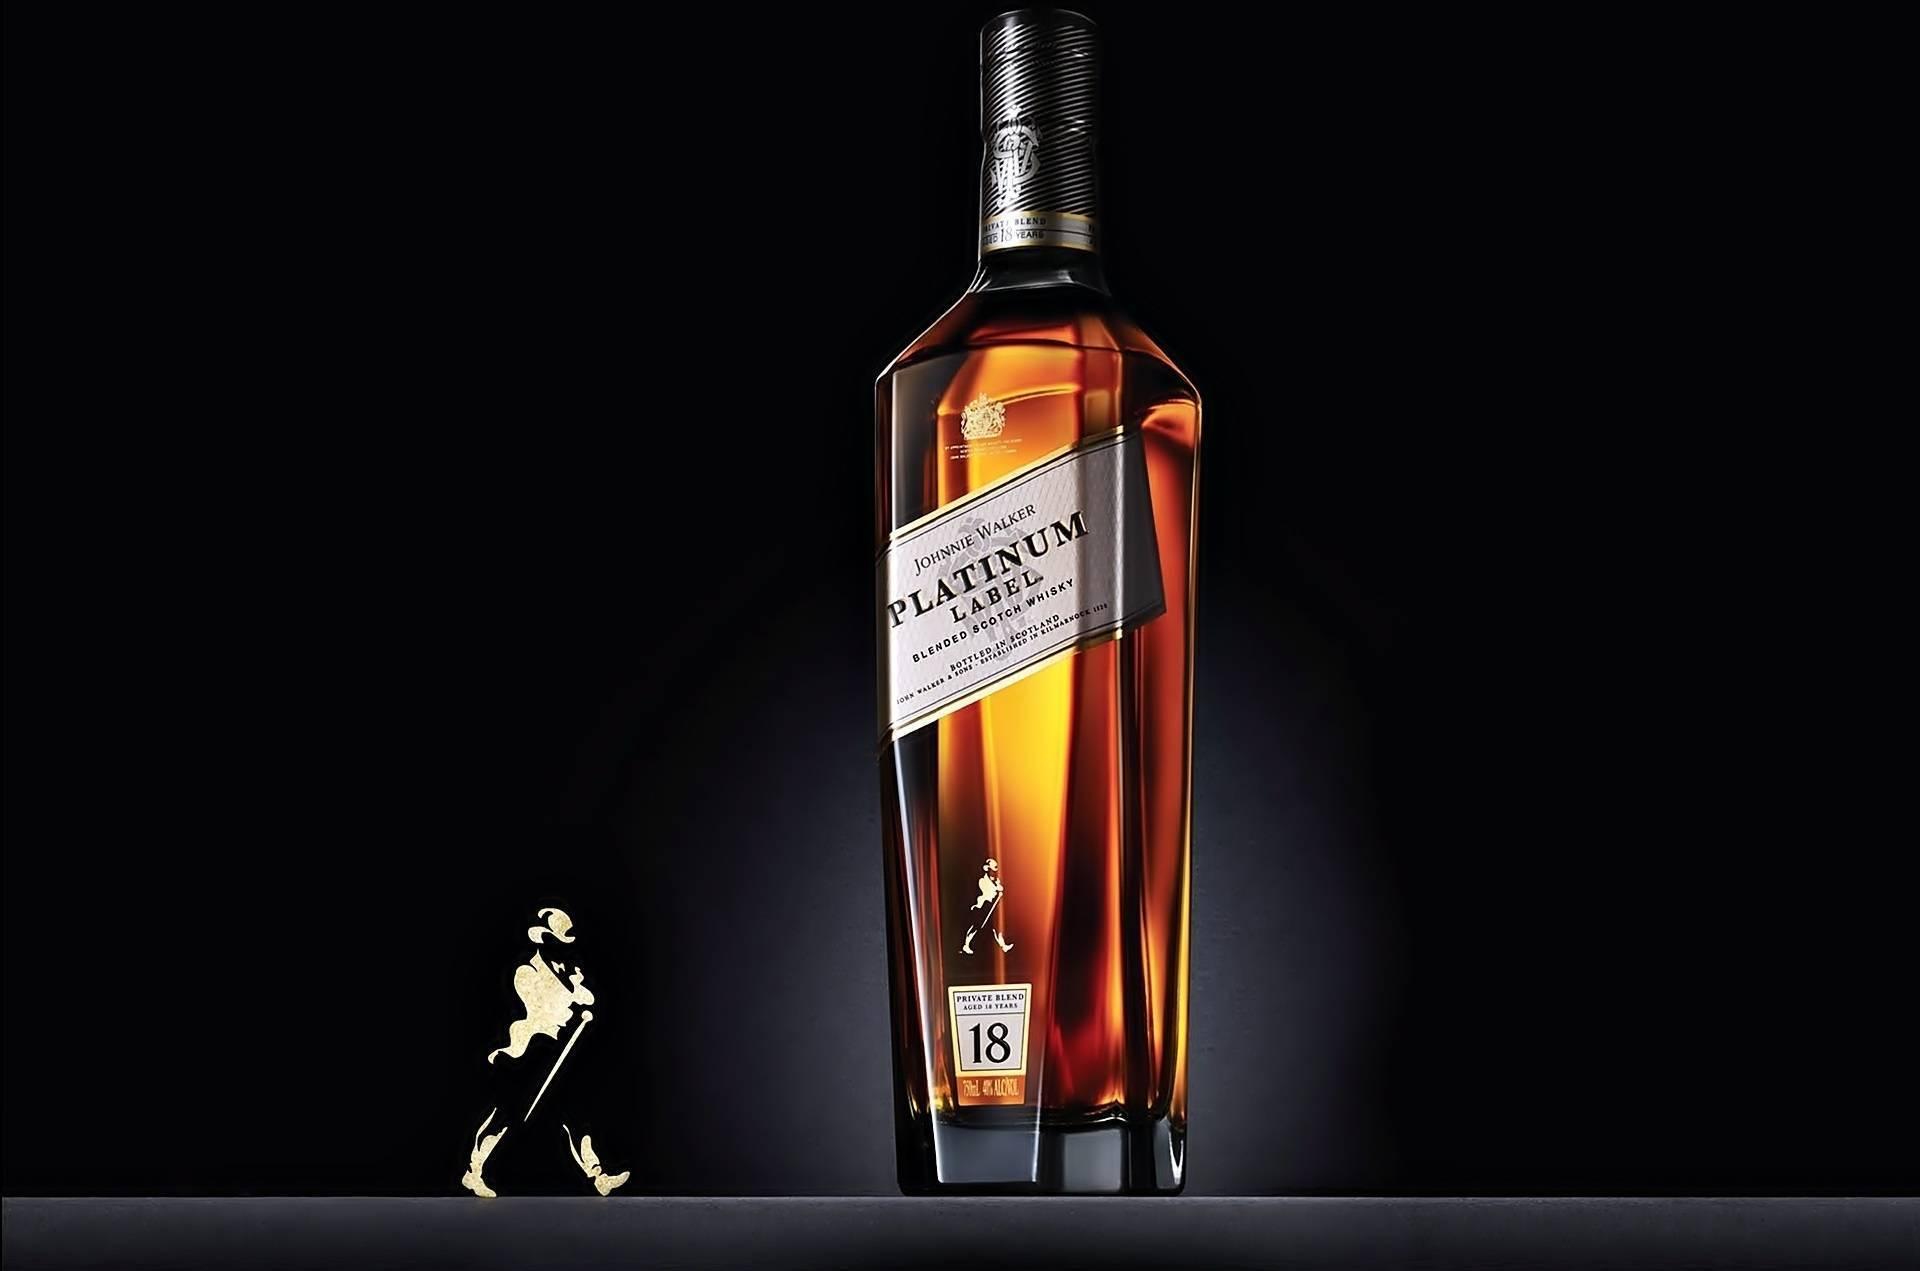 Johnnie walker, виски шотландский: описание, состав и отзывы